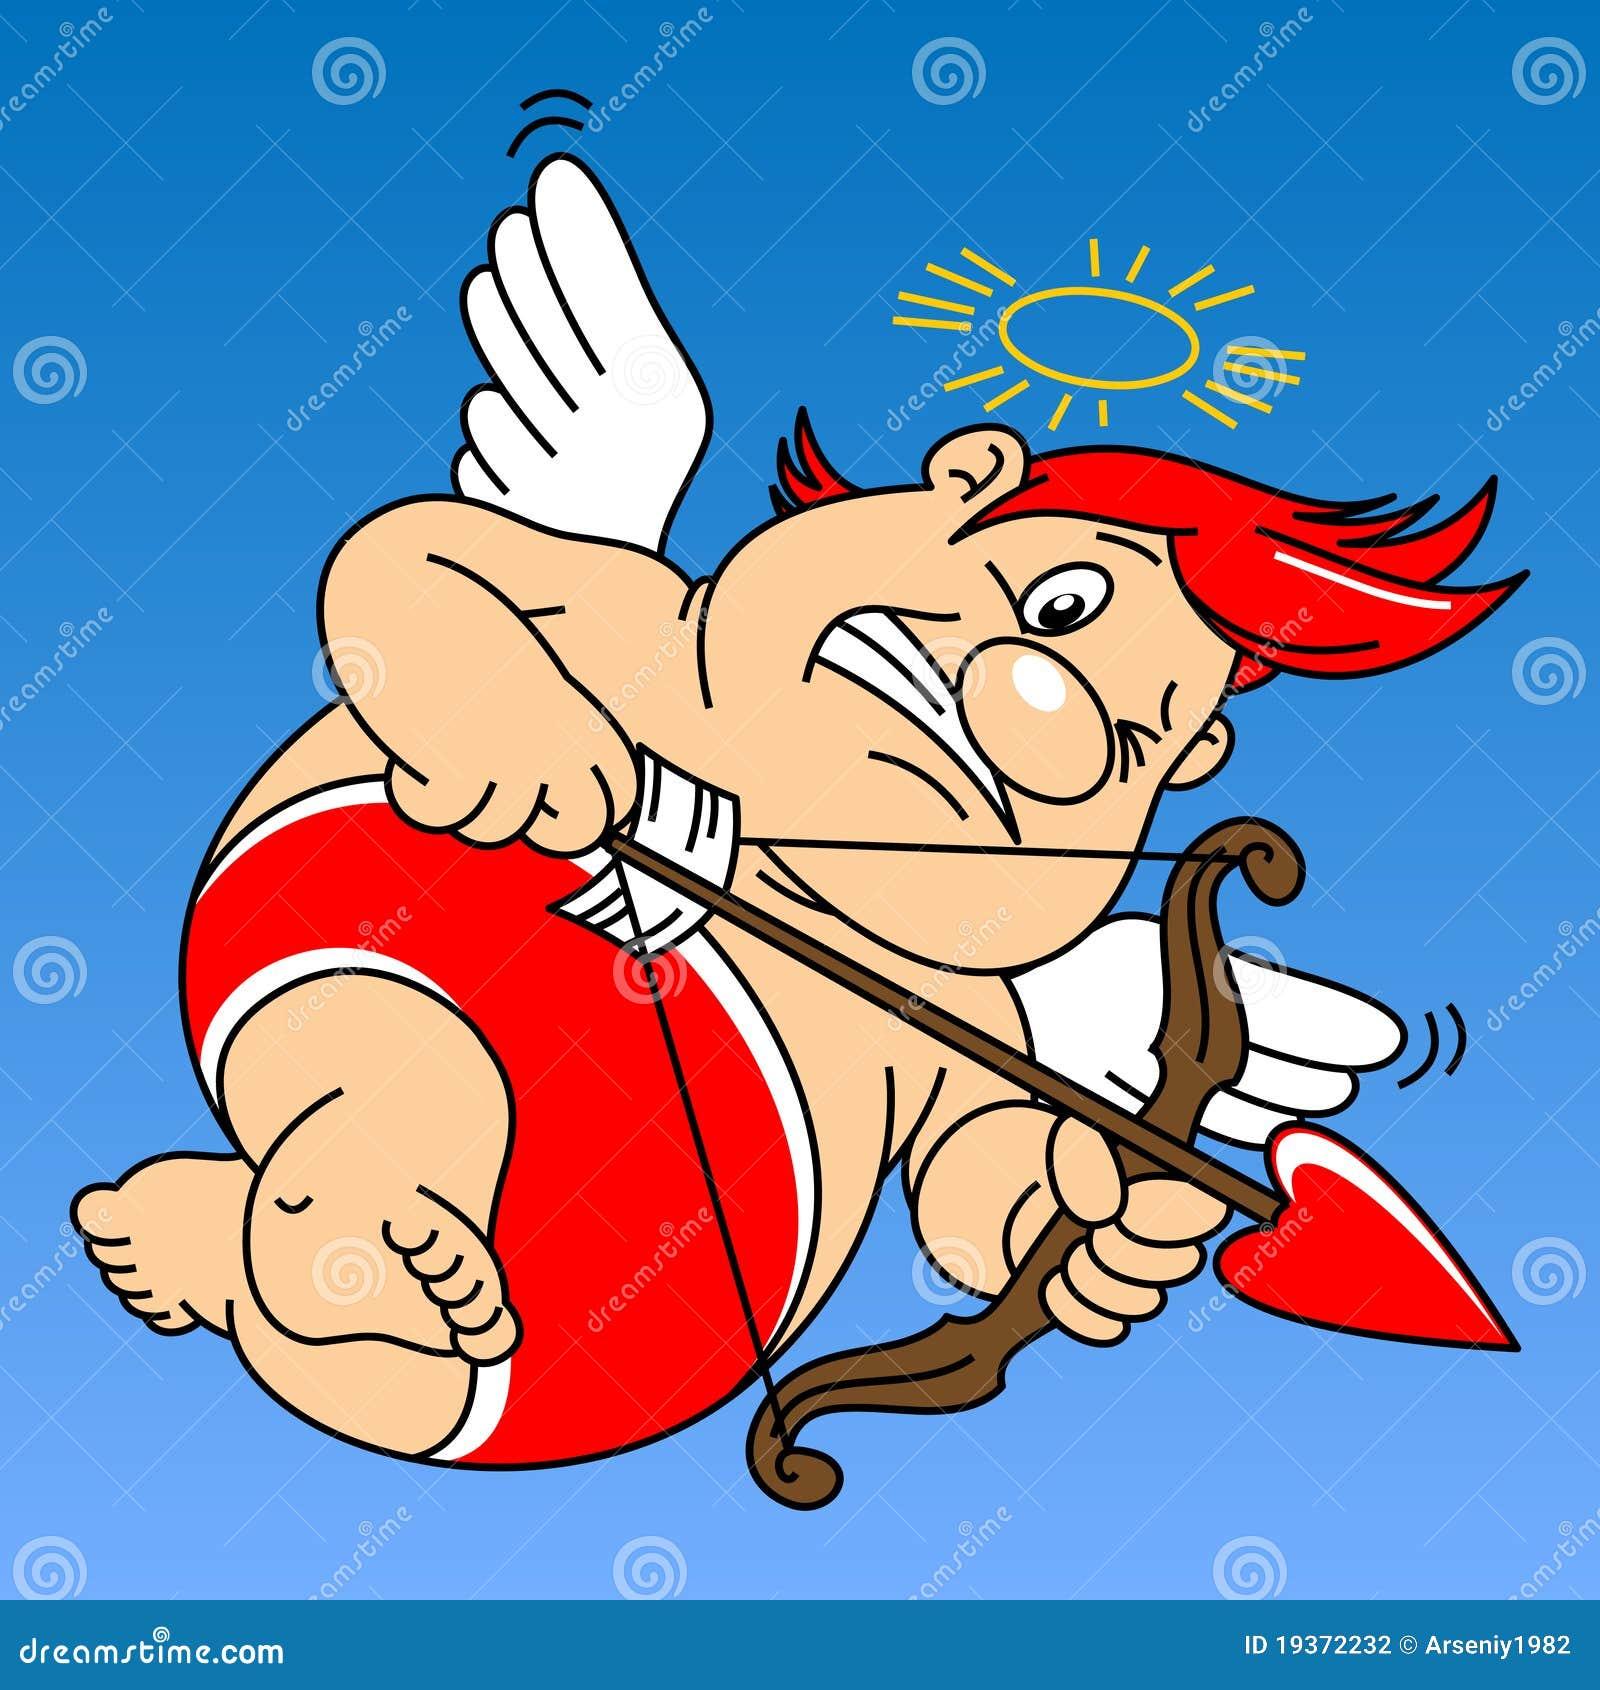 Cupid gordo engraçado